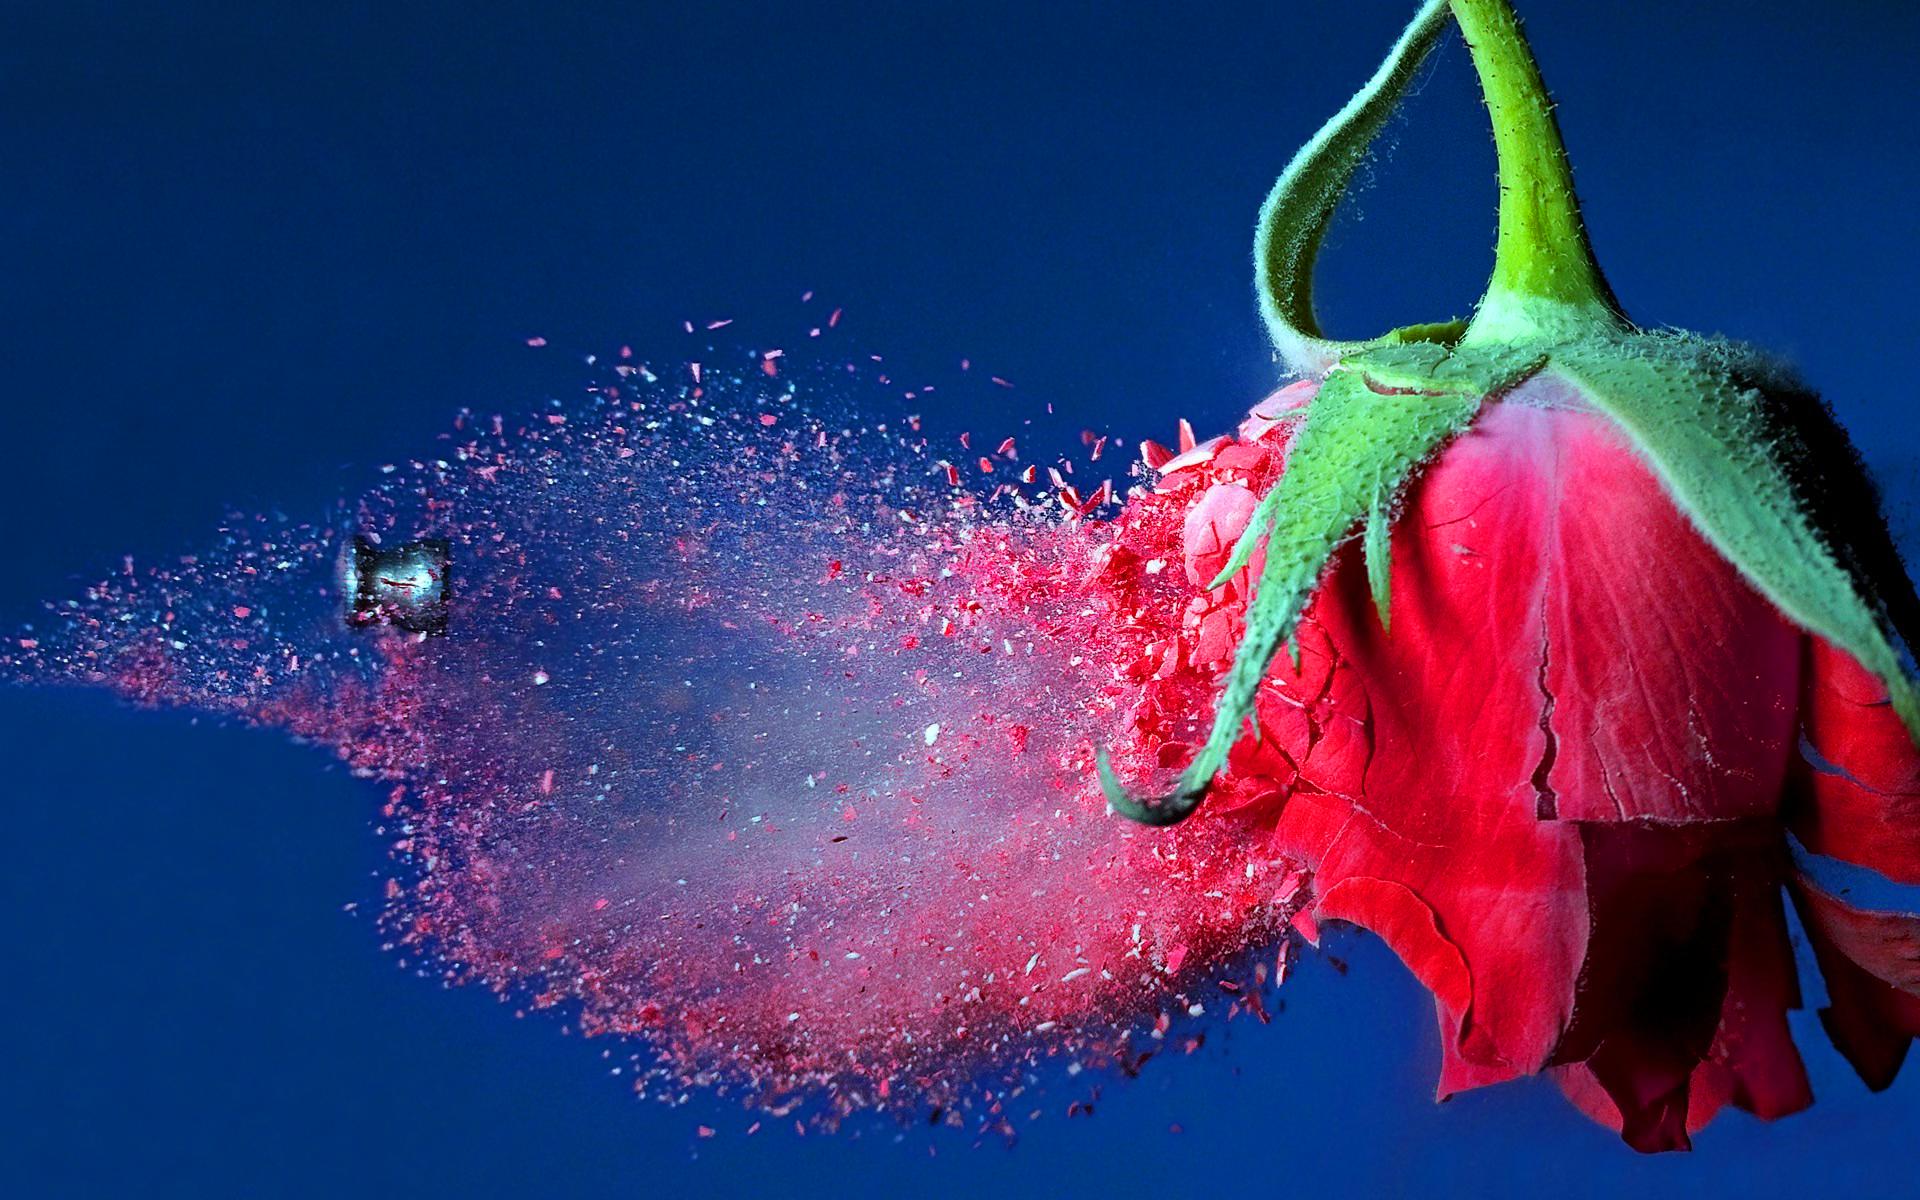 Bullet through rose